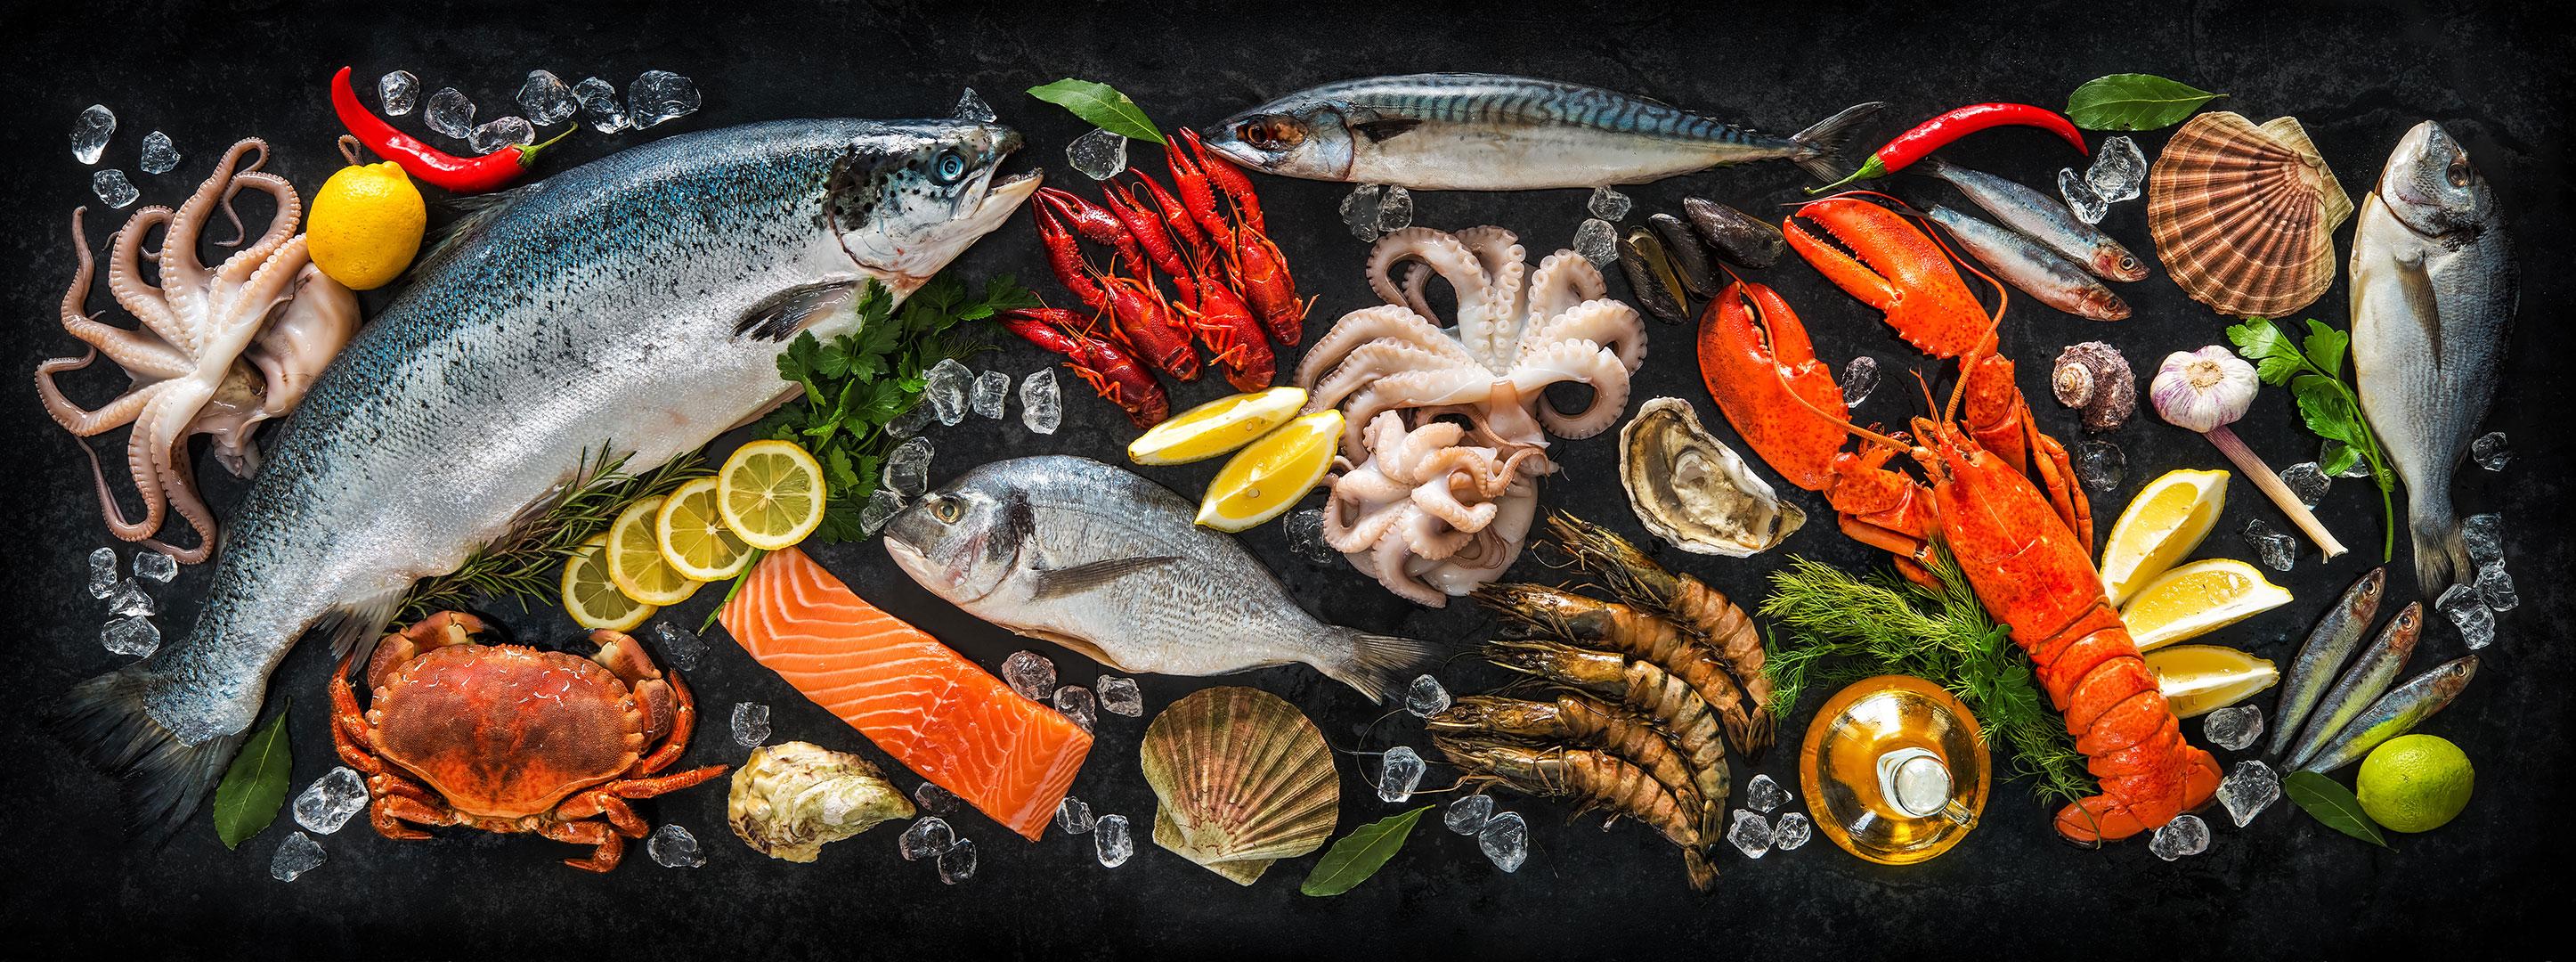 Riba ribi grize rep